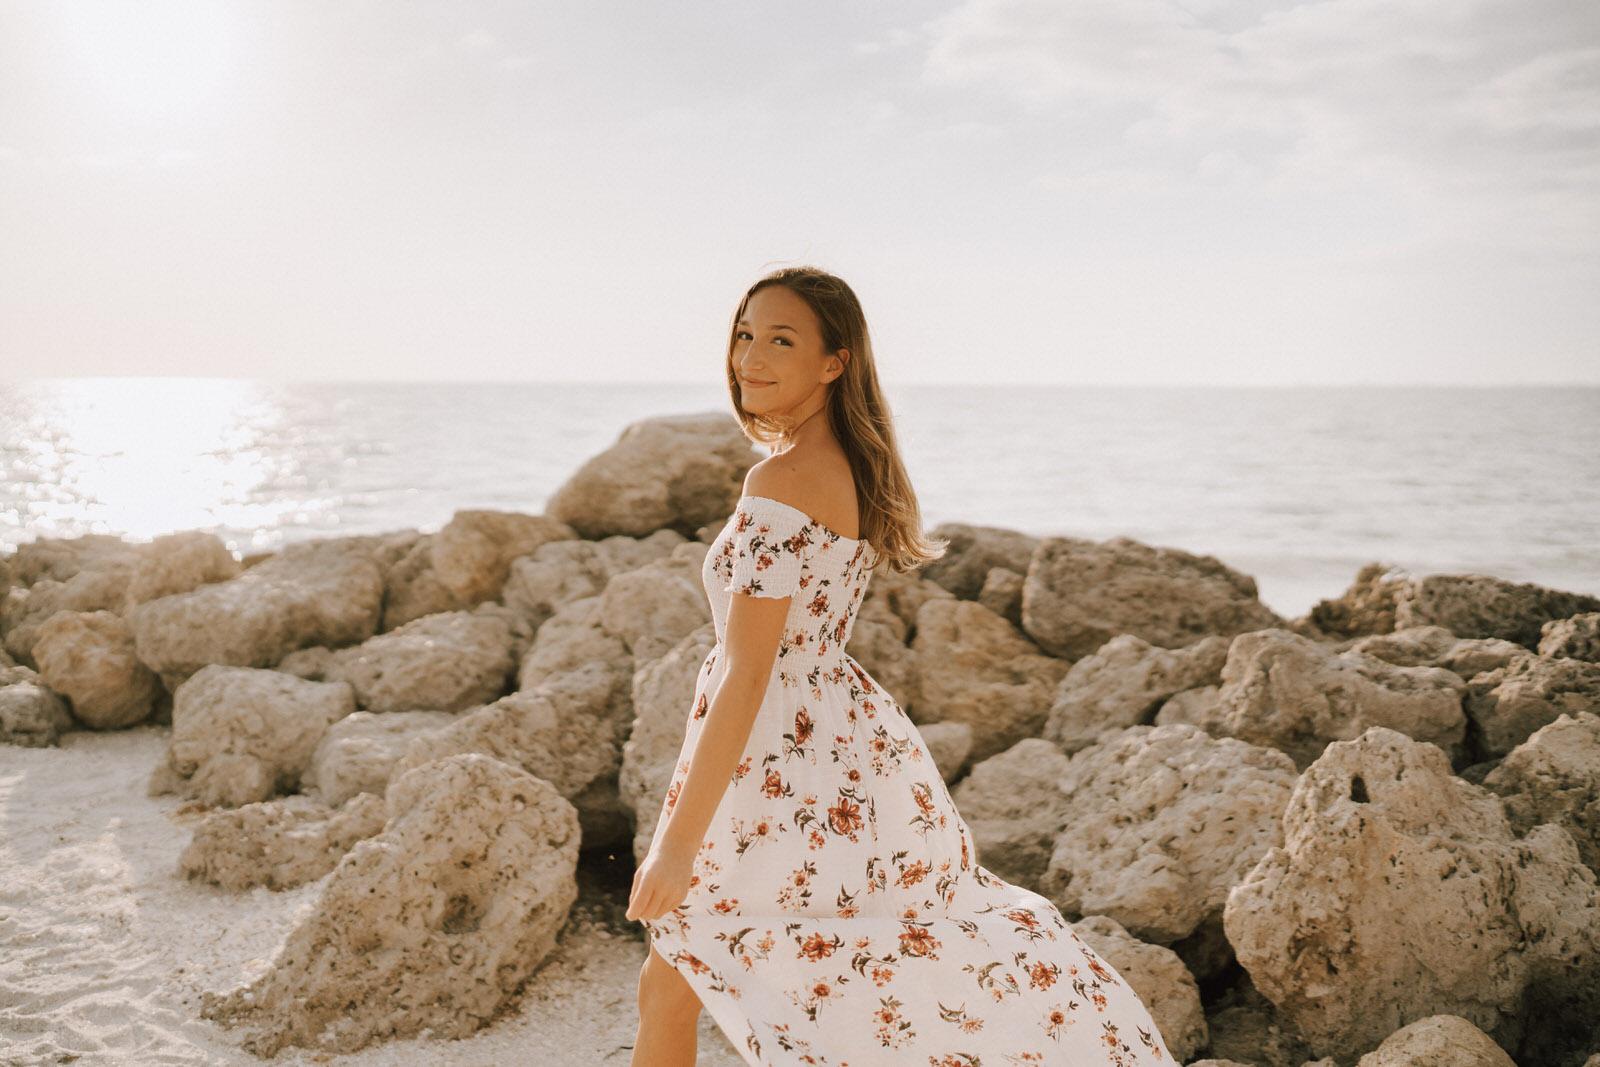 Fort Myers Senior Photos on Bonita Beach - Michelle Gonzalez Photography - Sammie-2.JPG